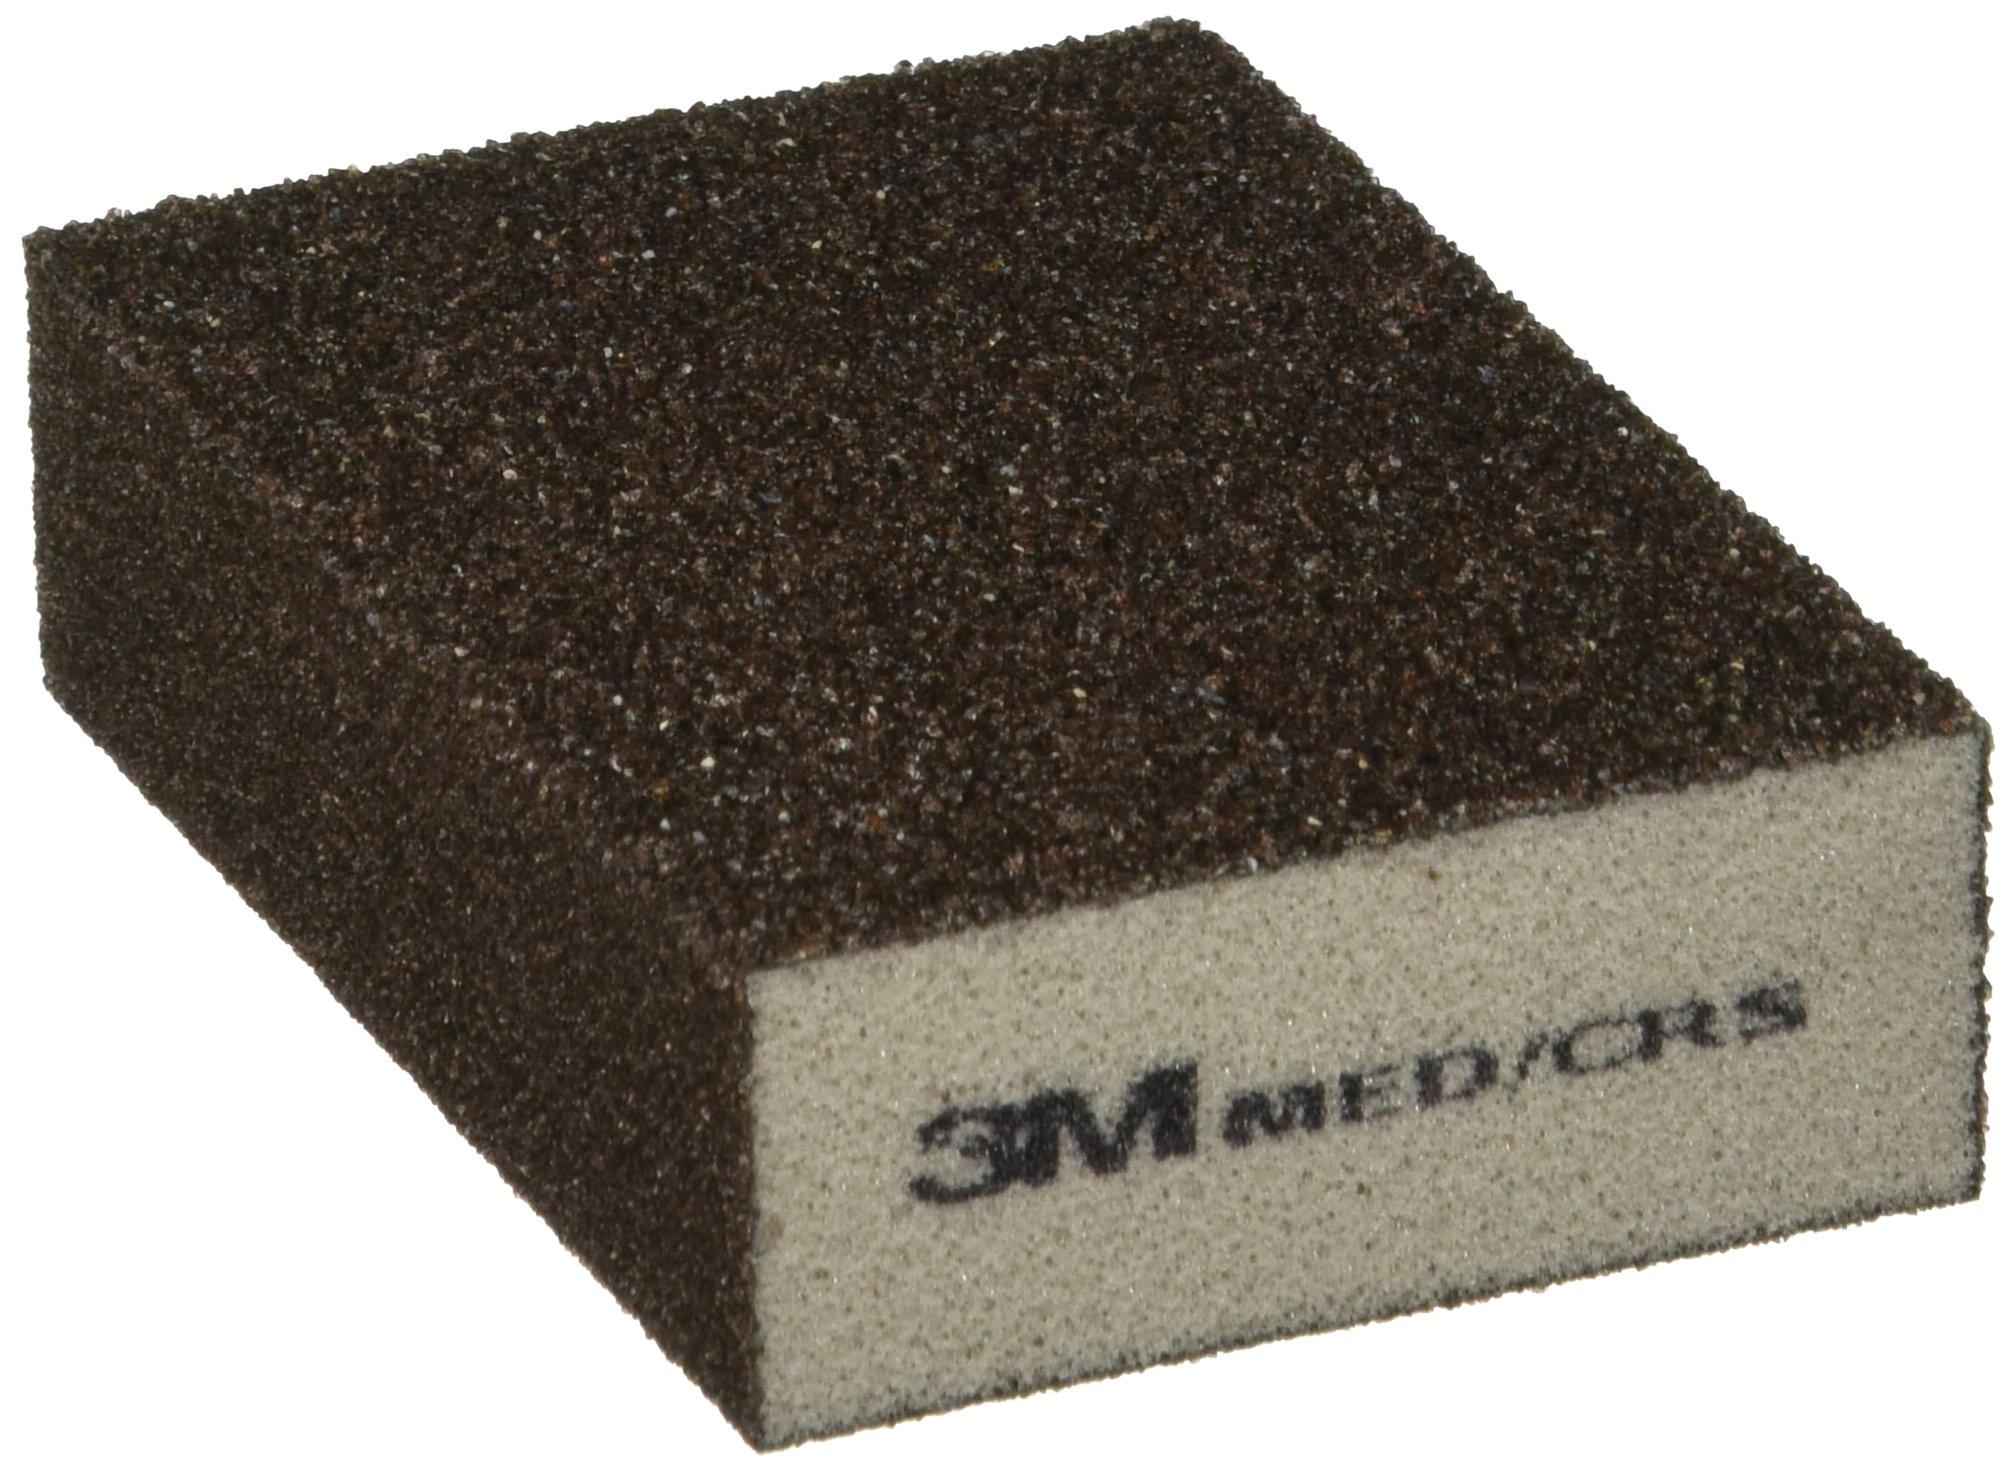 3M 19093 2.625-Inch by 3.75-Inch by 1-Inch Fine//Medium Grit Drywall Sanding Sponge 2-Pack